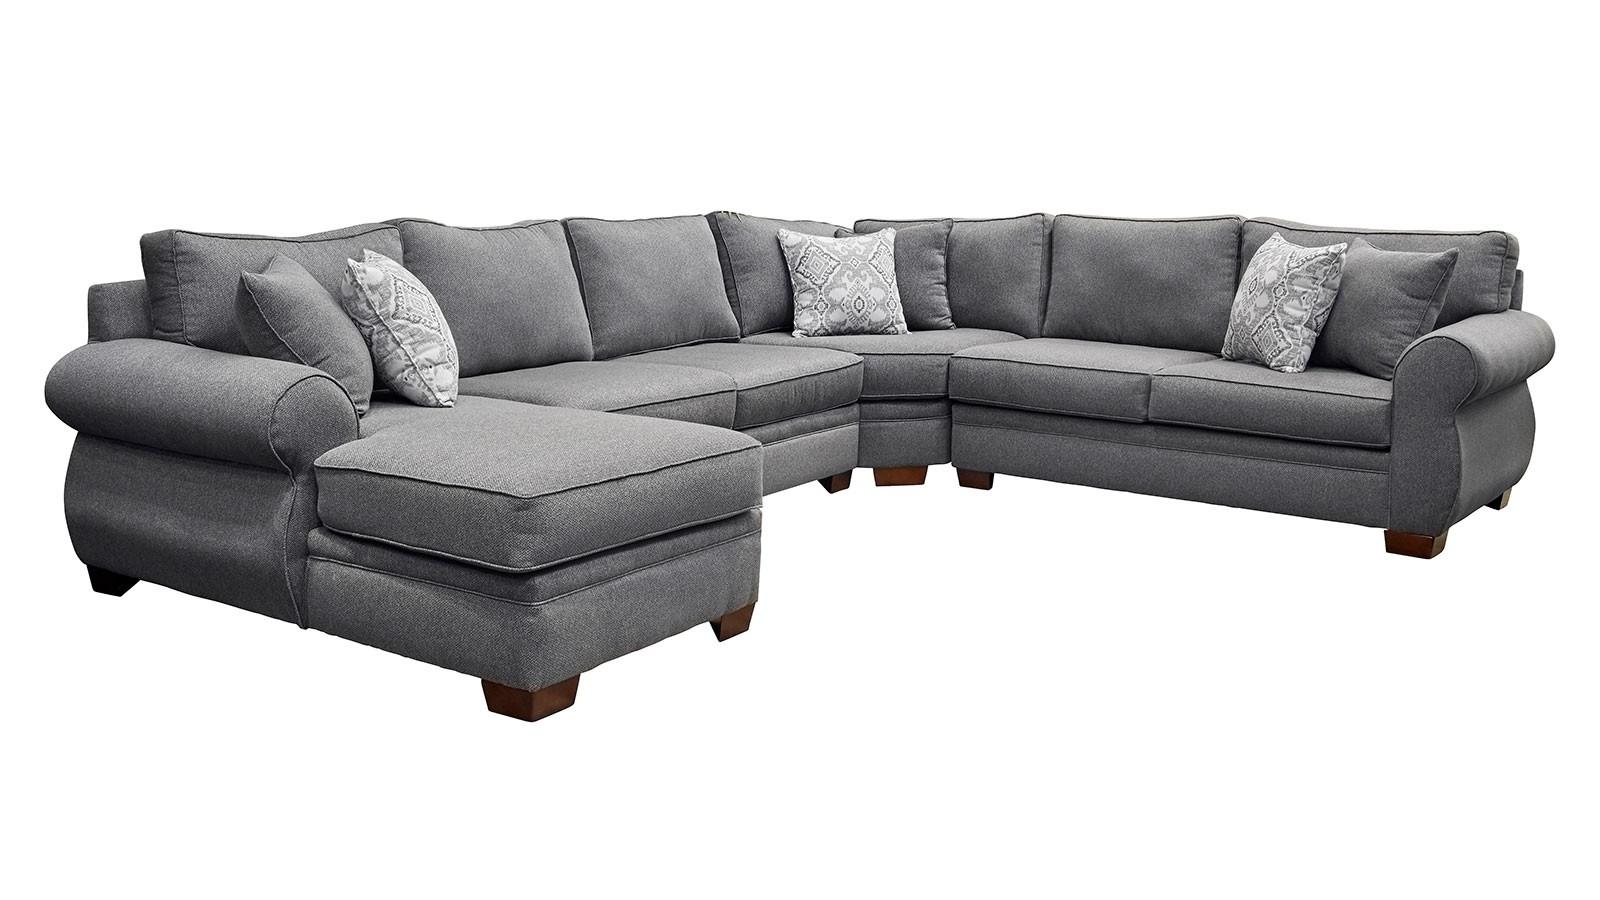 Fashionable Gallery Furniture Sectional Sofas Regarding Smoke Raf Sectional (View 2 of 20)